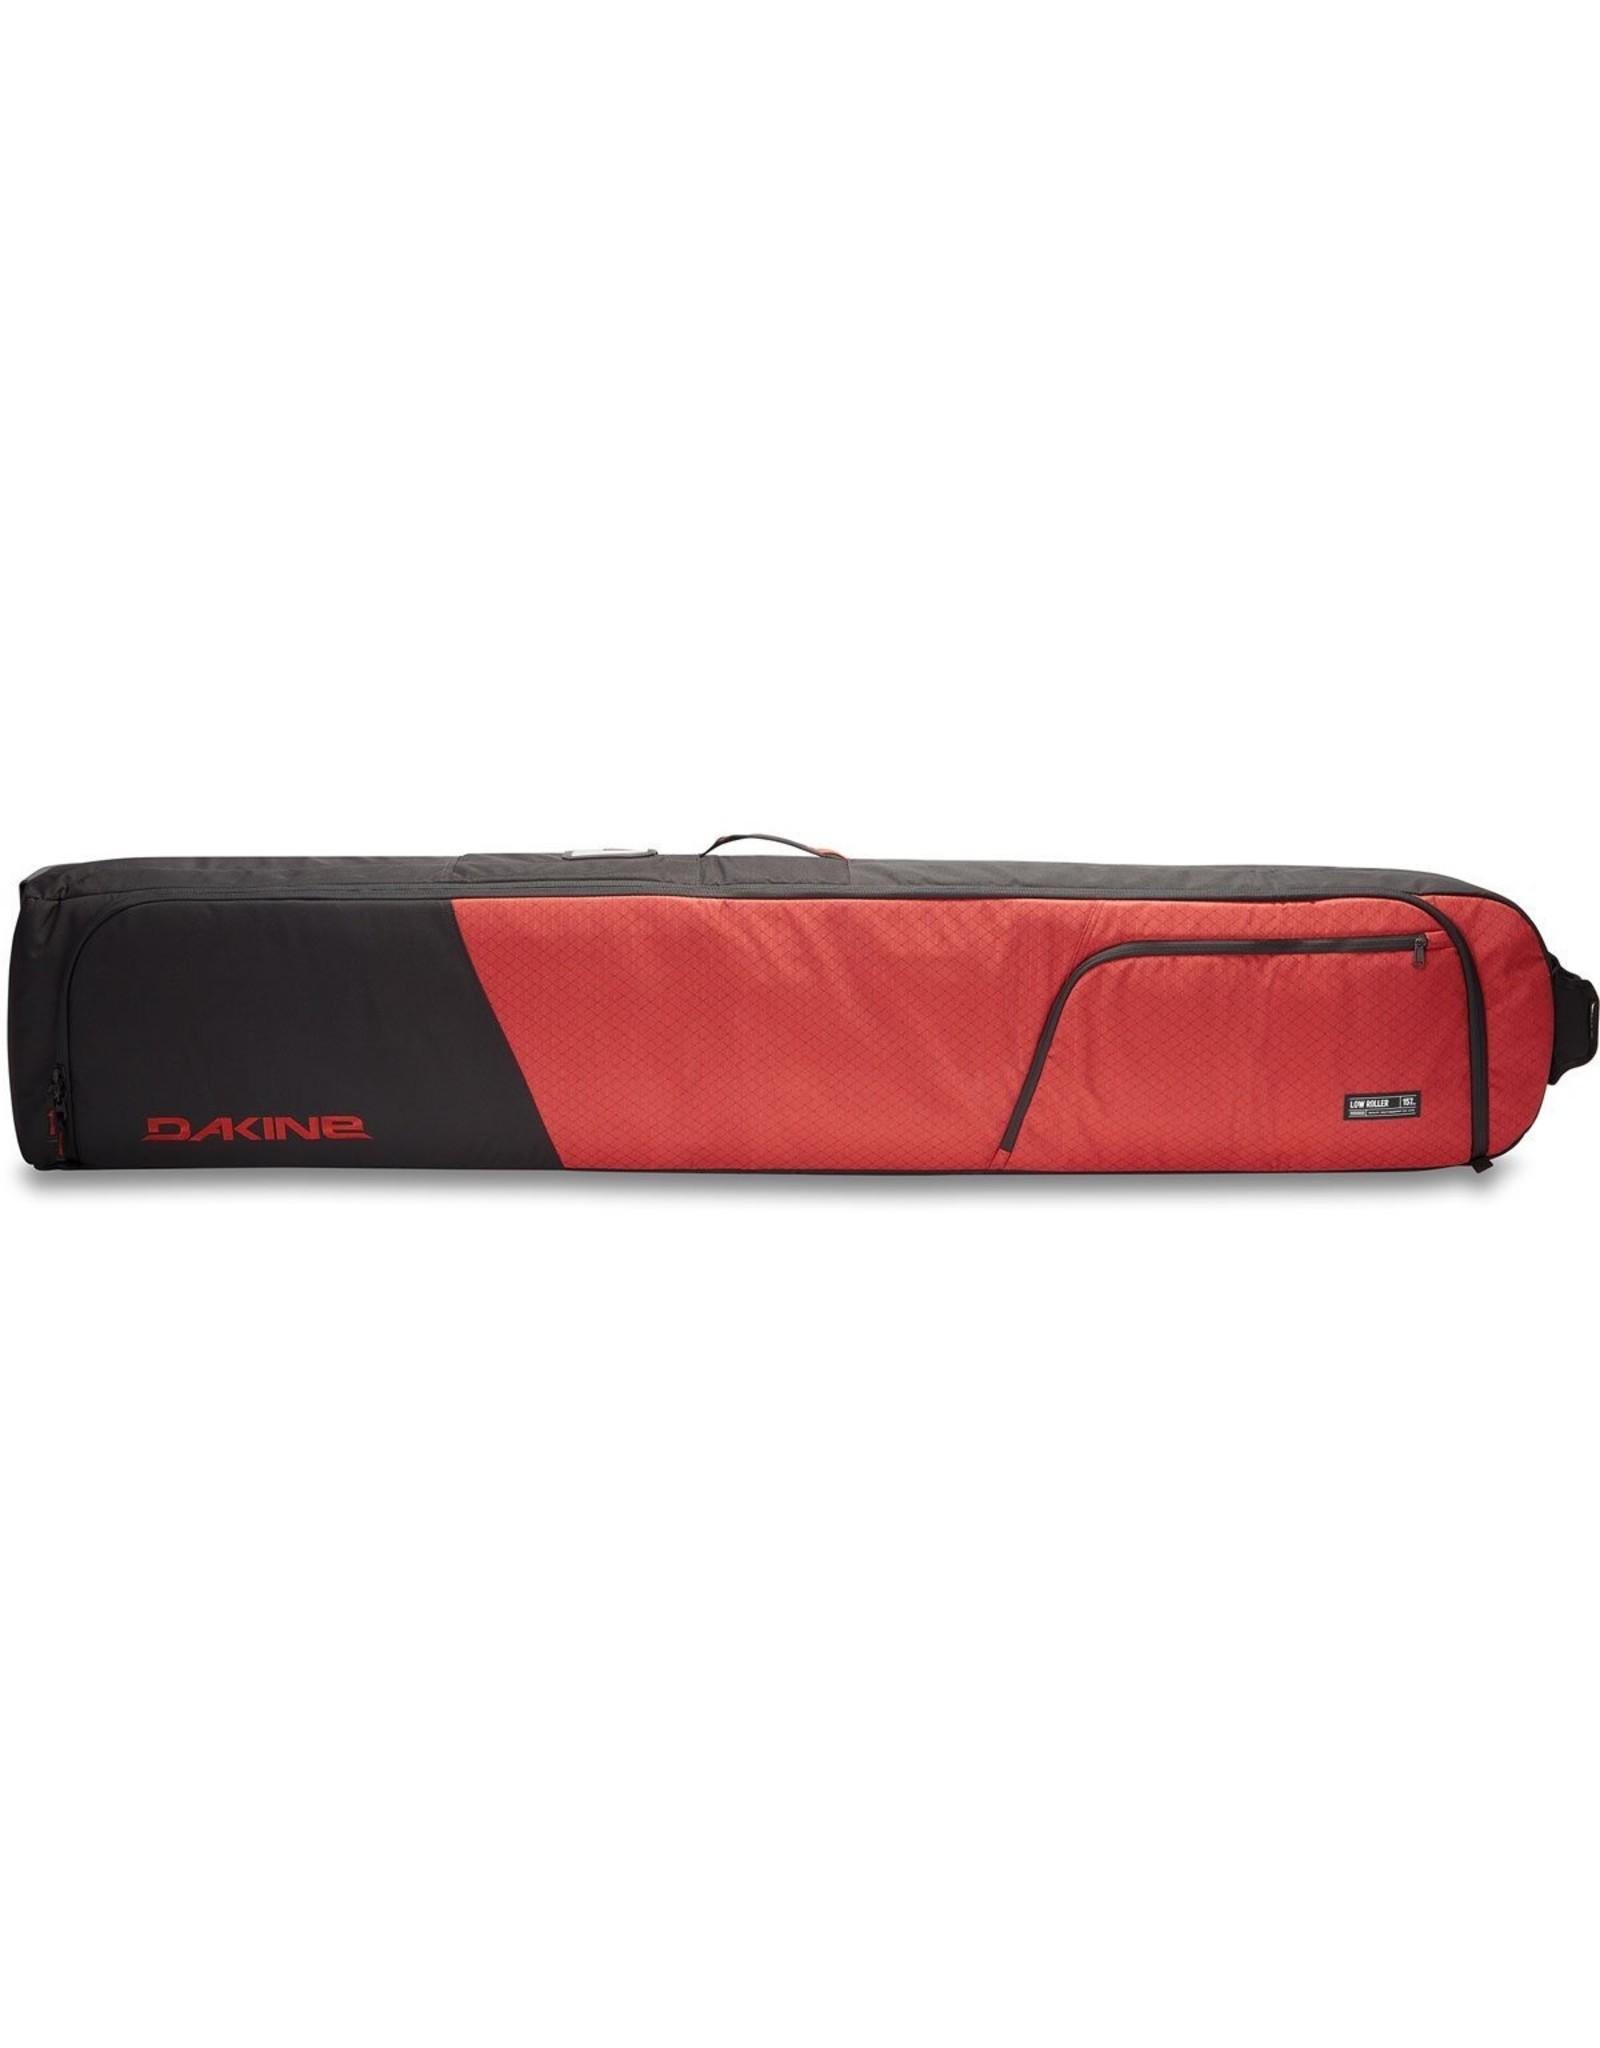 DAKINE DAKINE - LOW ROLLER BAG - RED - 157